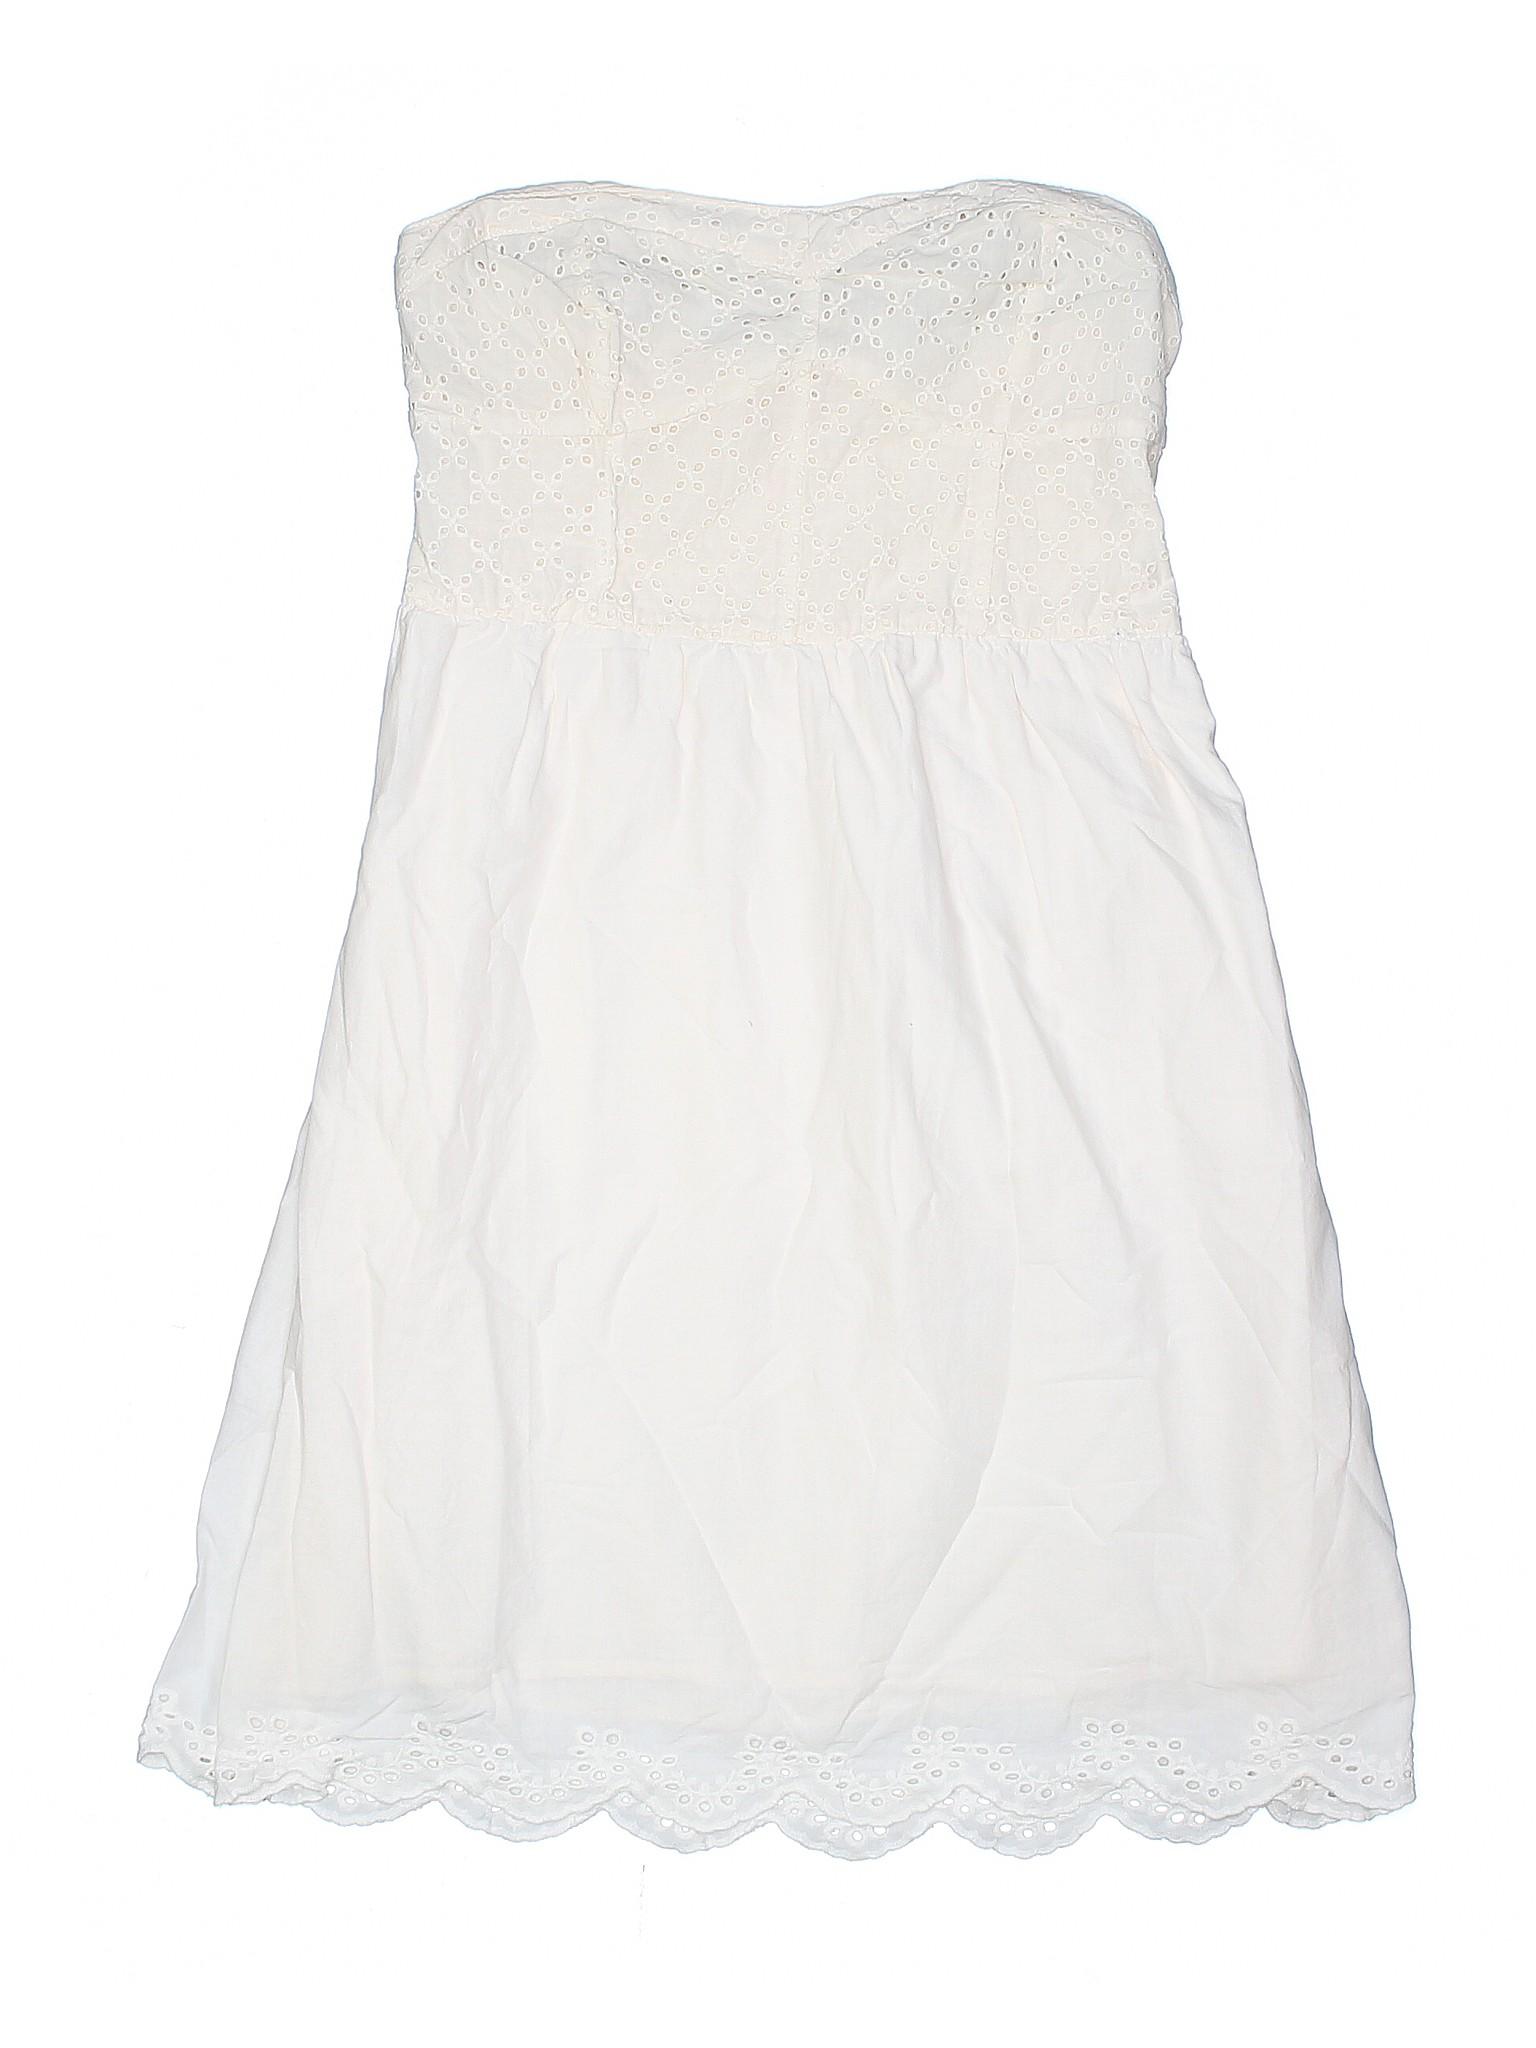 Xhilaration Casual Boutique Dress Winter Boutique Winter 0xztIq40